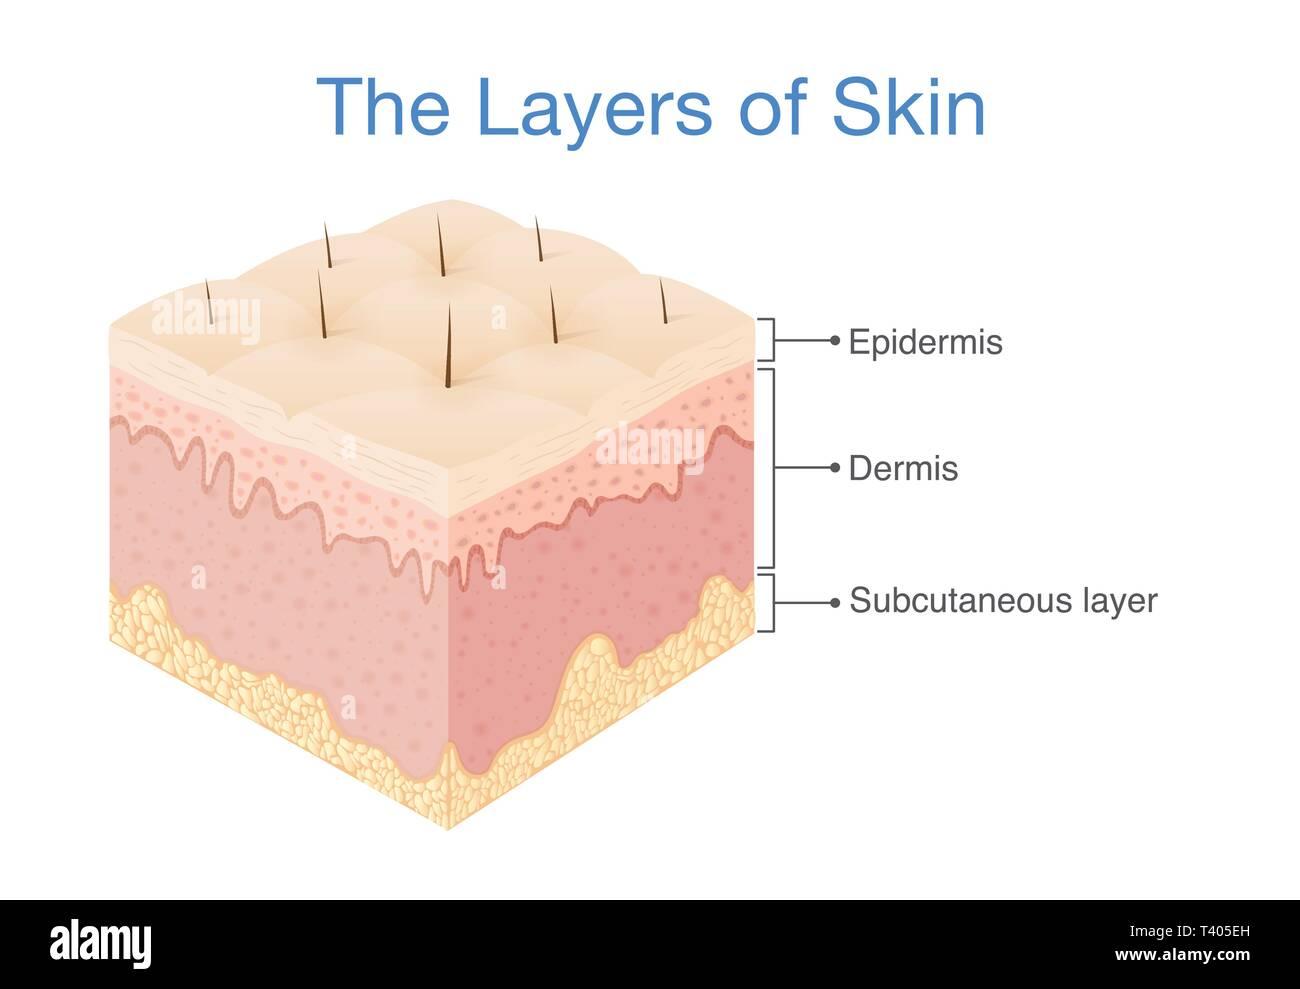 Human Skin Diagram Stock Photos Amp Human Skin Diagram Stock